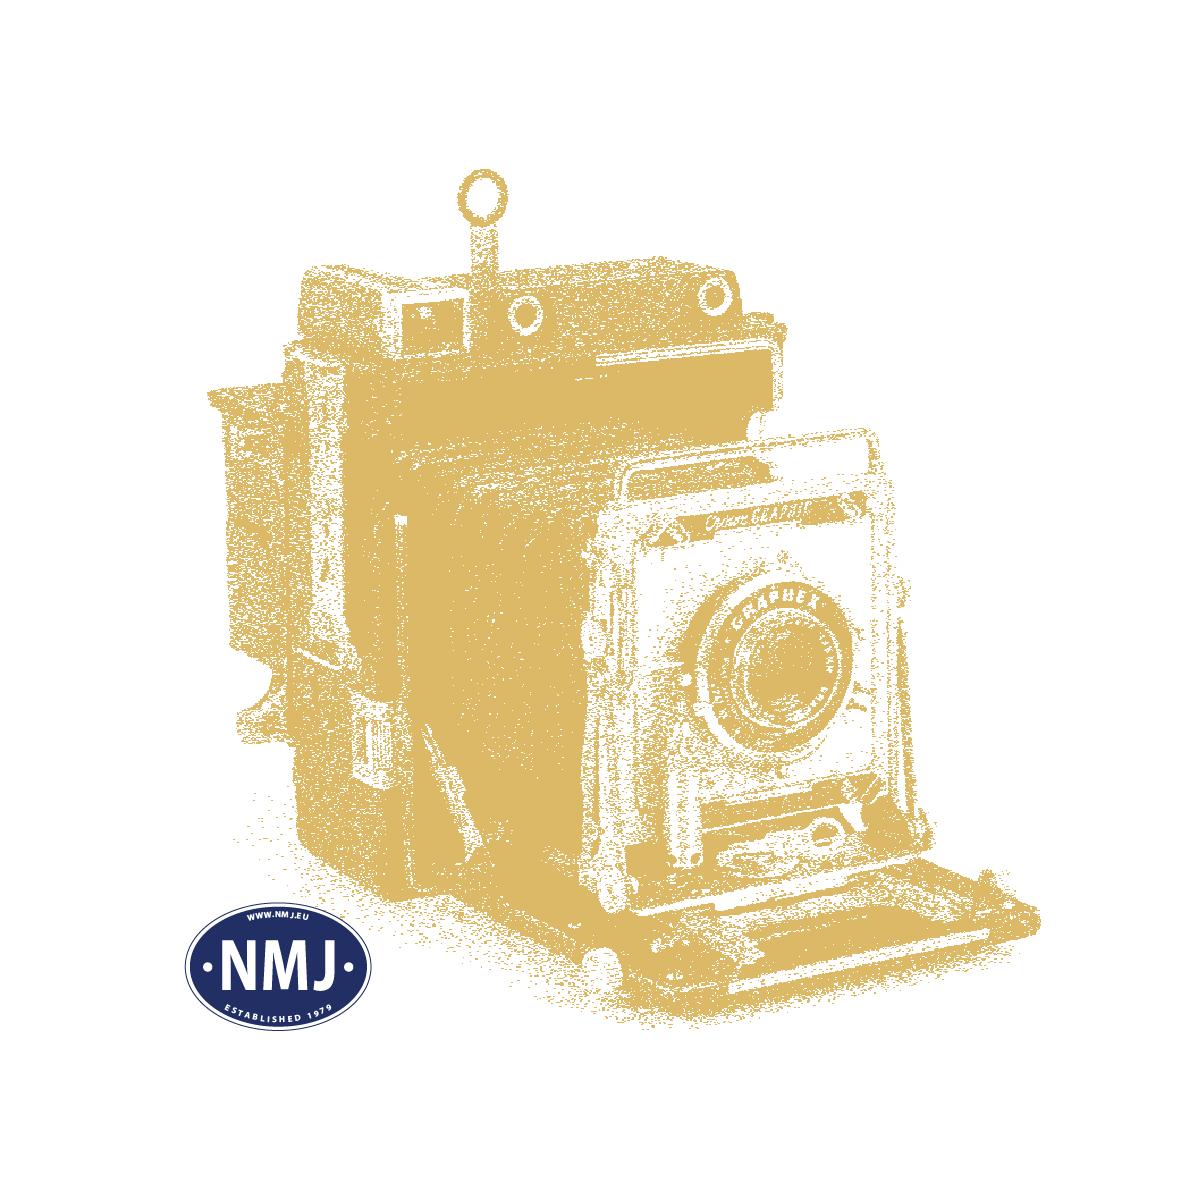 NMJT107.303 - NMJ Topline B3-2 25593 2.Kl Personenwagen der NSB, Rot/schwarz